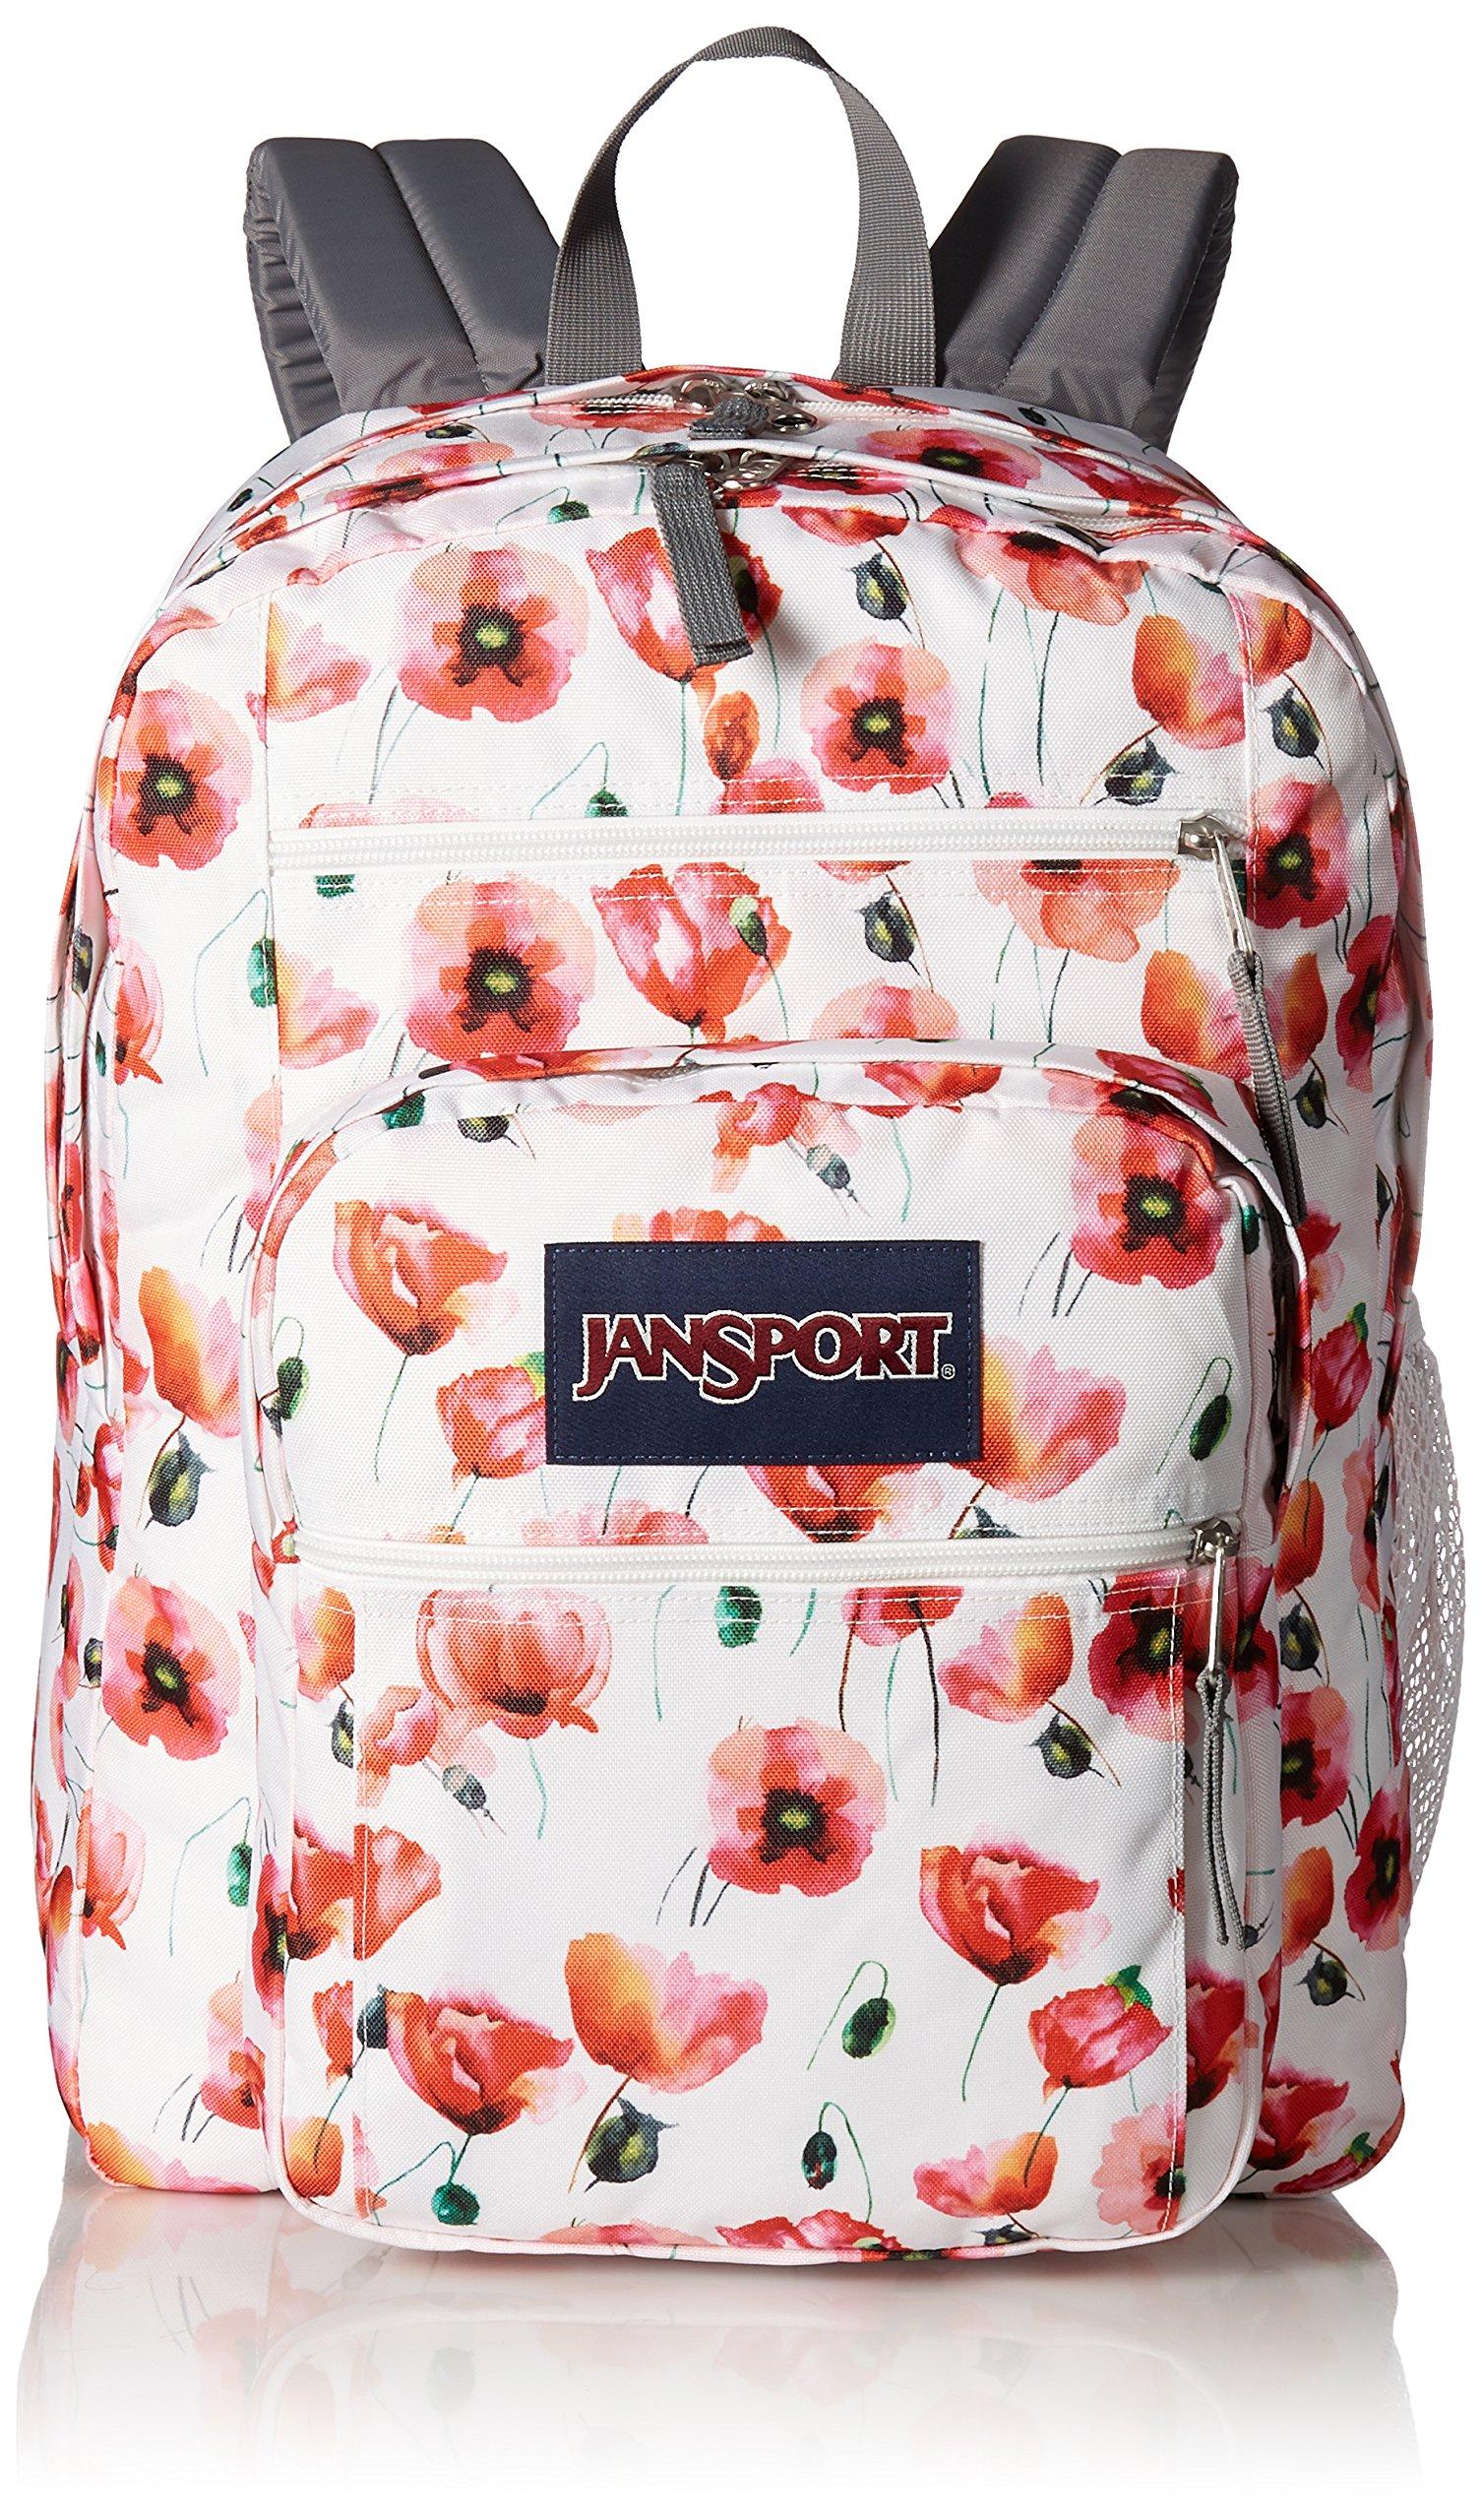 JanSport Unisex Big Student Multi Cali Poppy Backpack